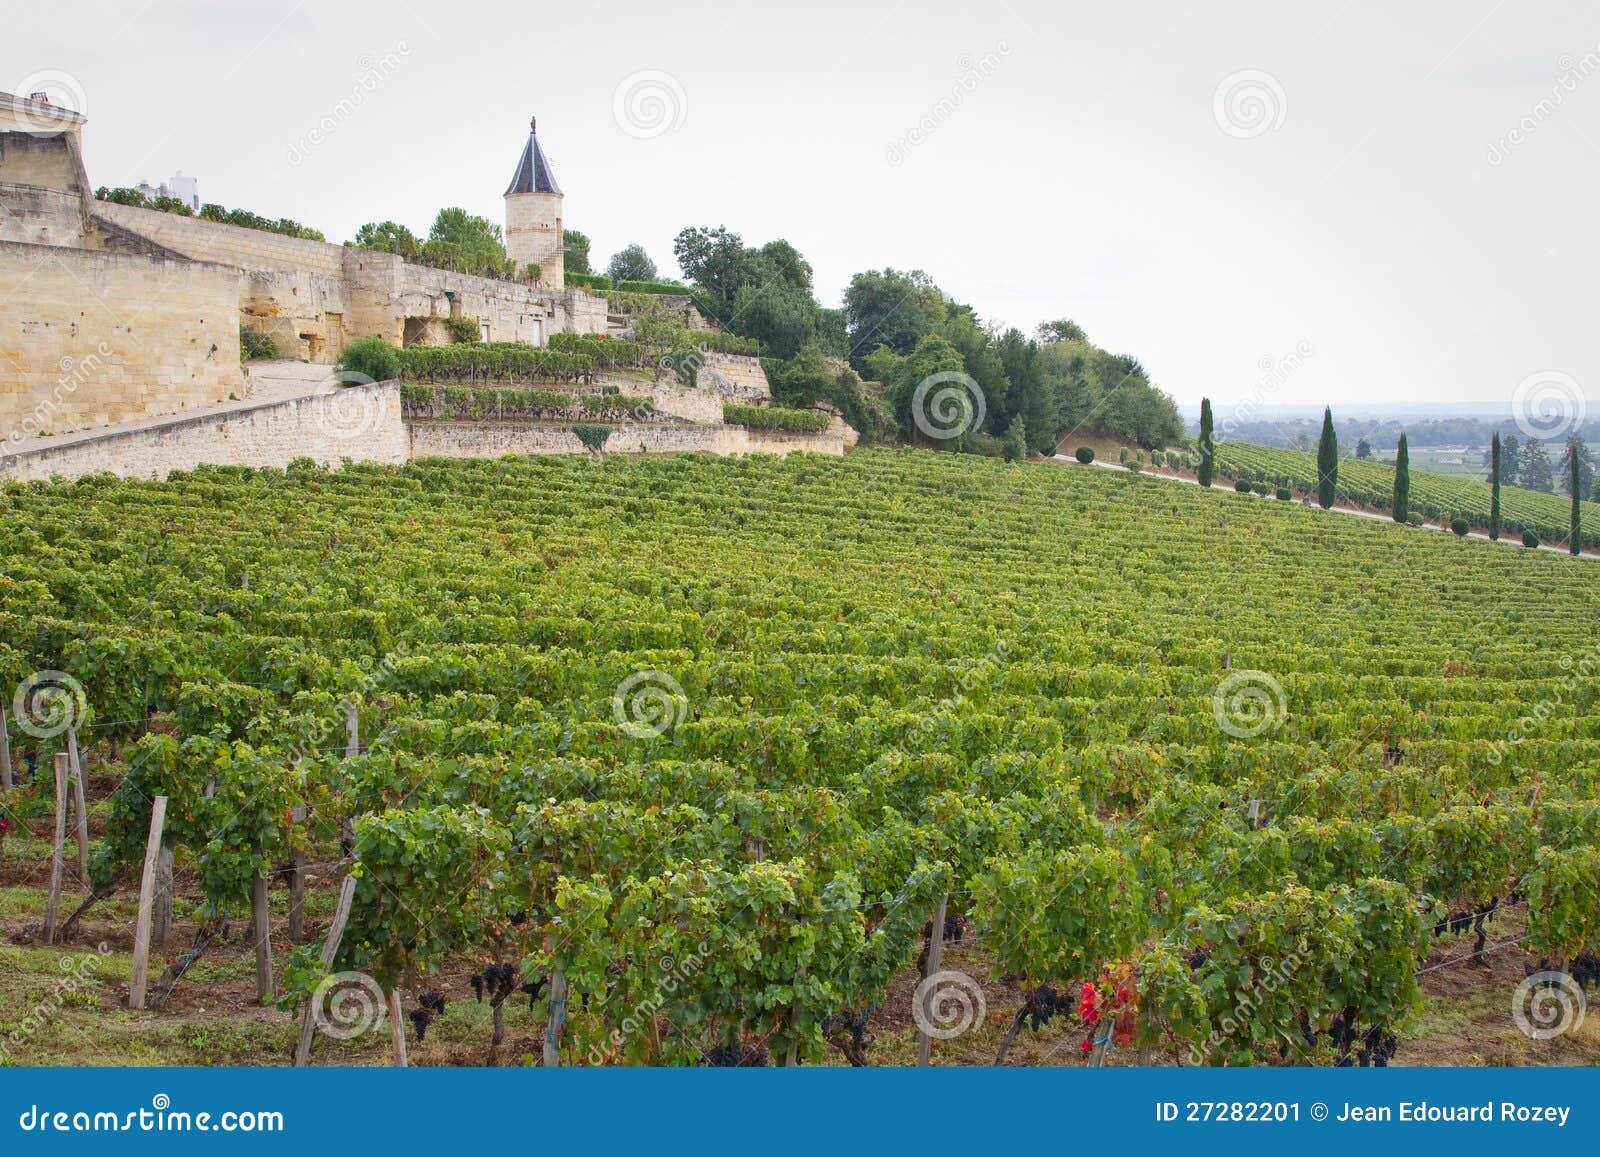 Sanktt Emilion vinodling